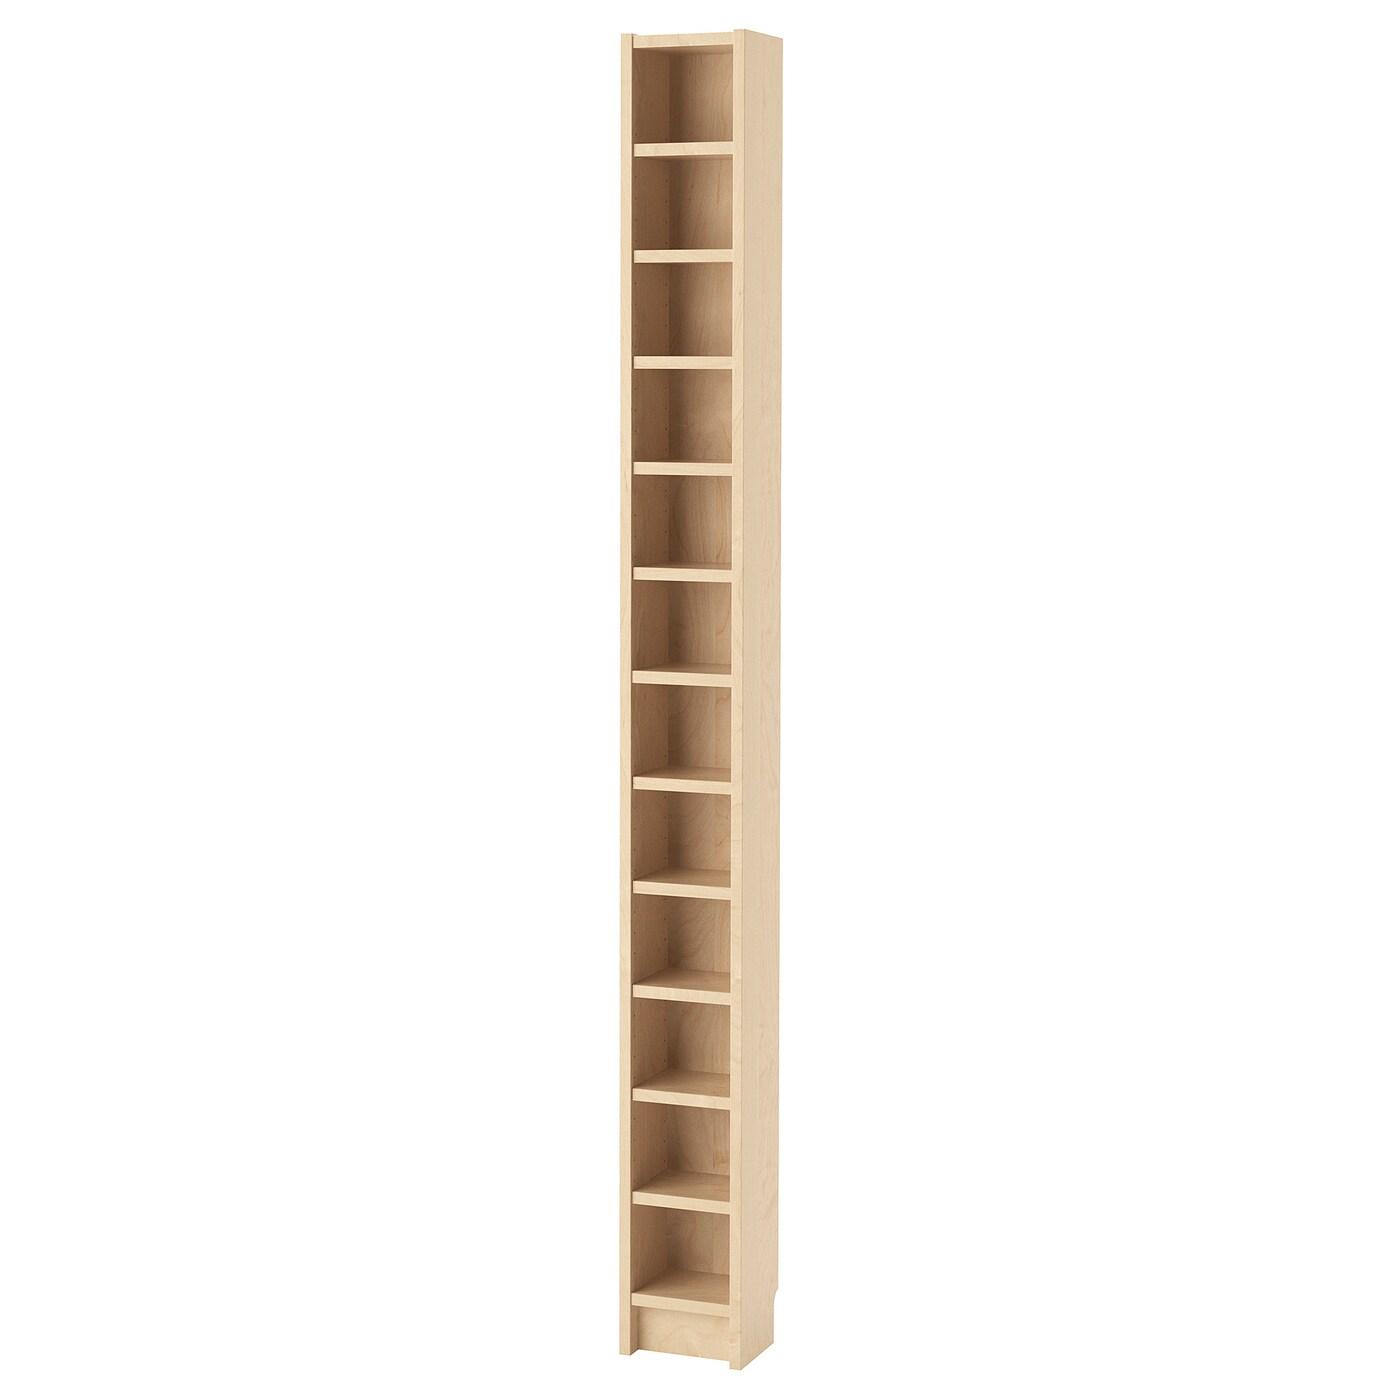 Shelf Unit Gnedby Birch Veneer